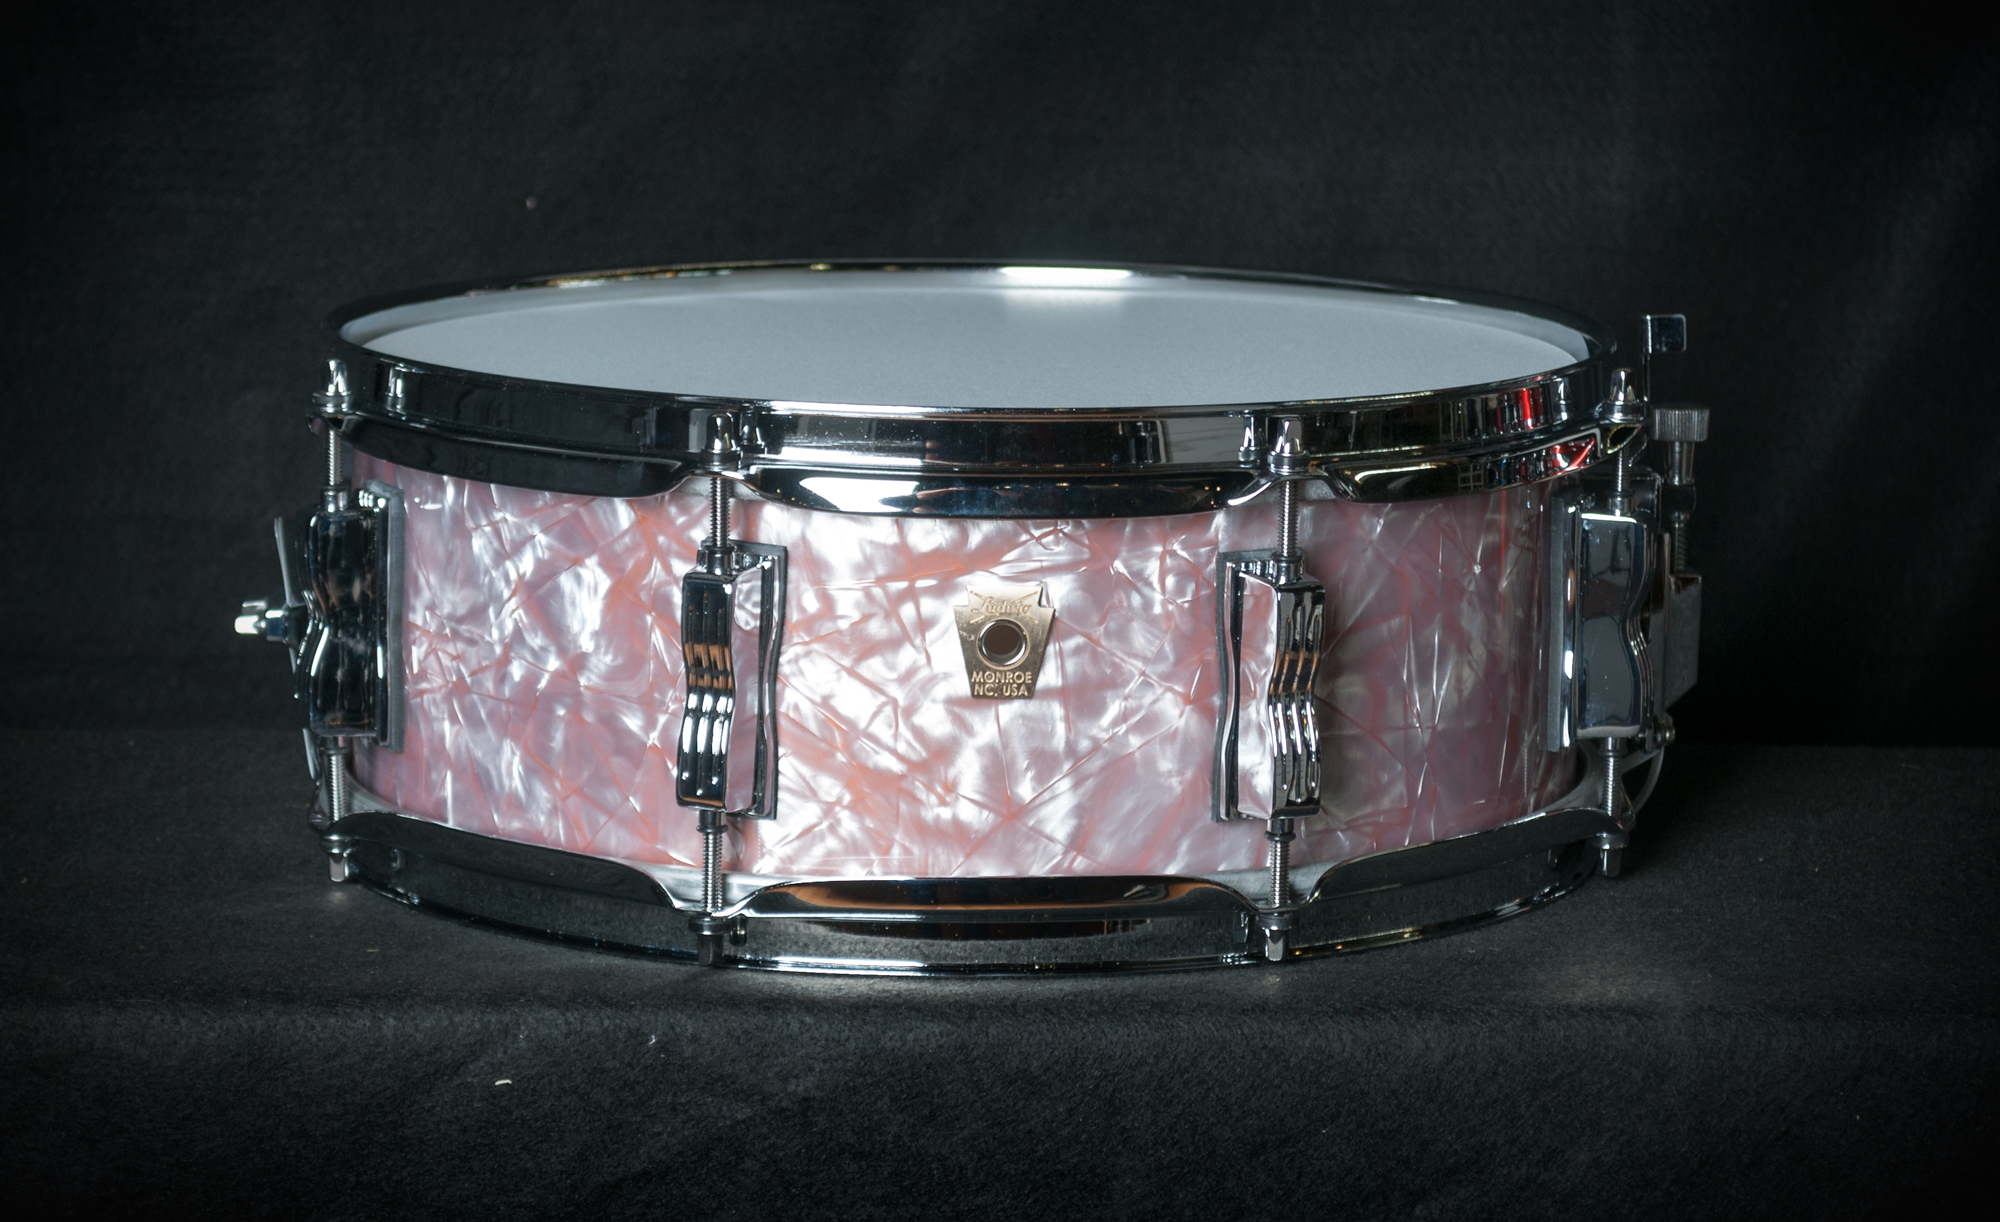 Snare Drum Wrap : ludwig limited edition classic maple 14x5 snare drum in copper pearl wrap finish ebay ~ Vivirlamusica.com Haus und Dekorationen